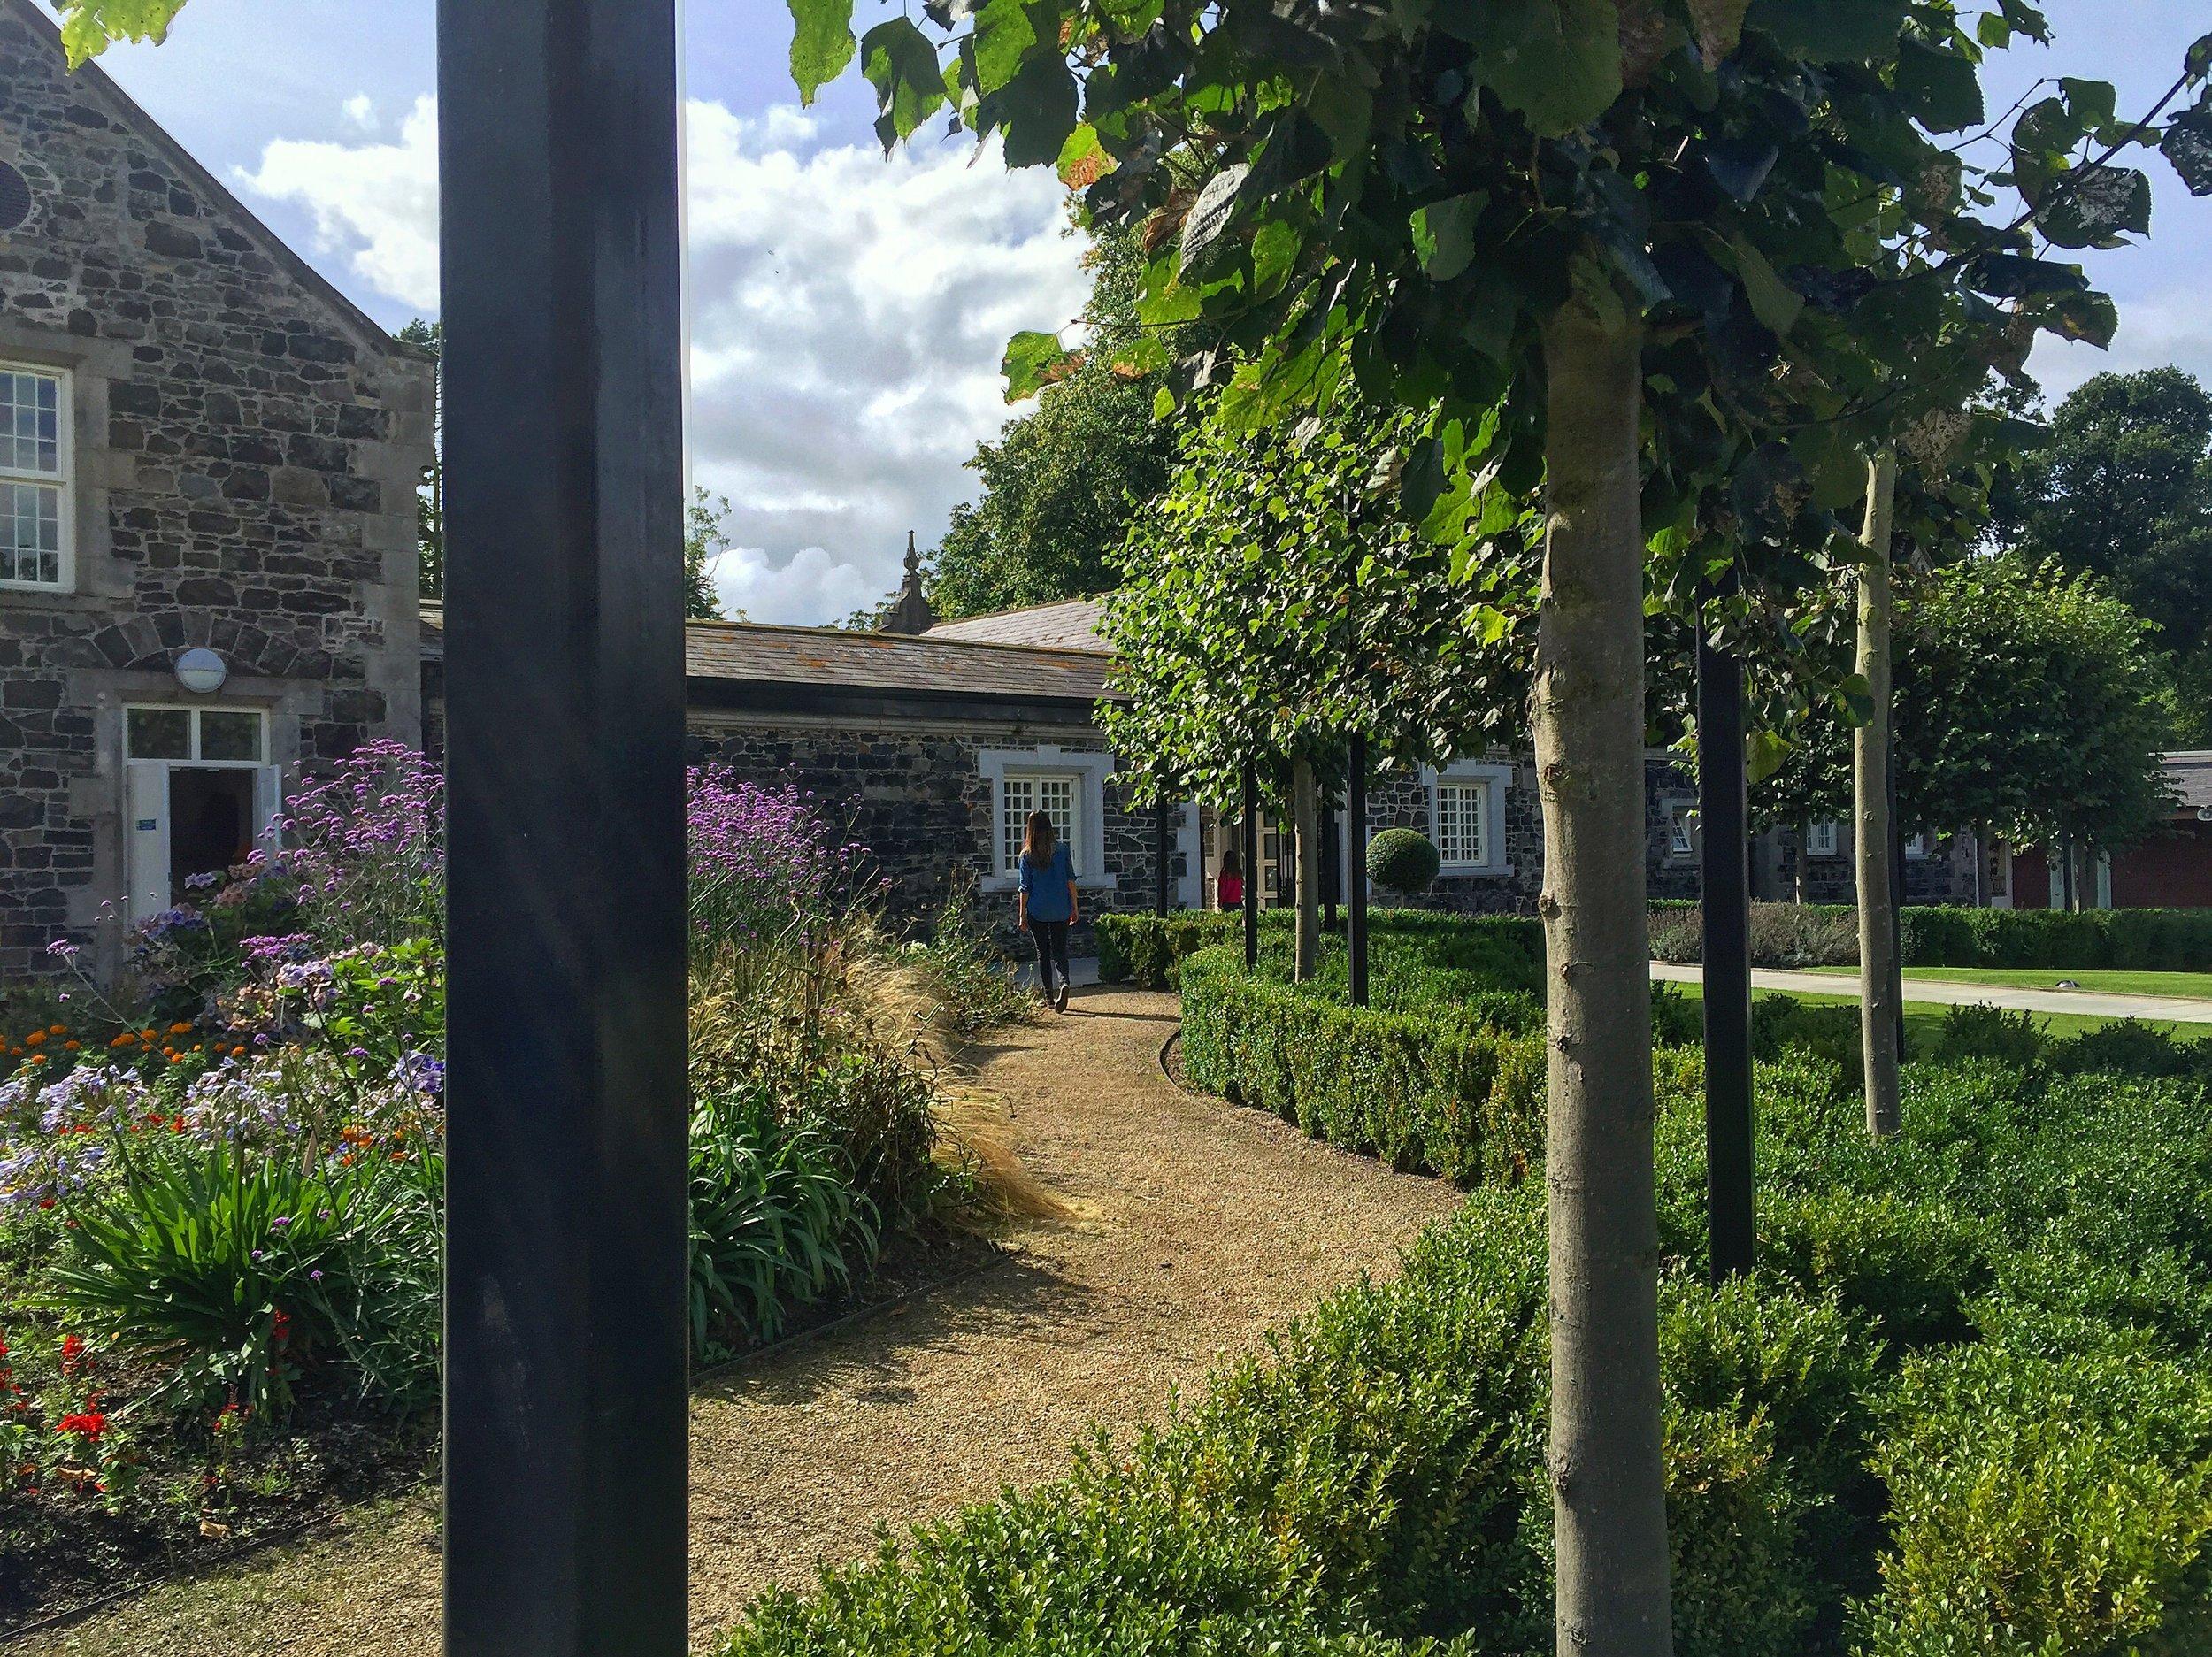 Antrim_castle_gardens_antrim_northern_ireland_ni_explorer_niexplorer.jpg